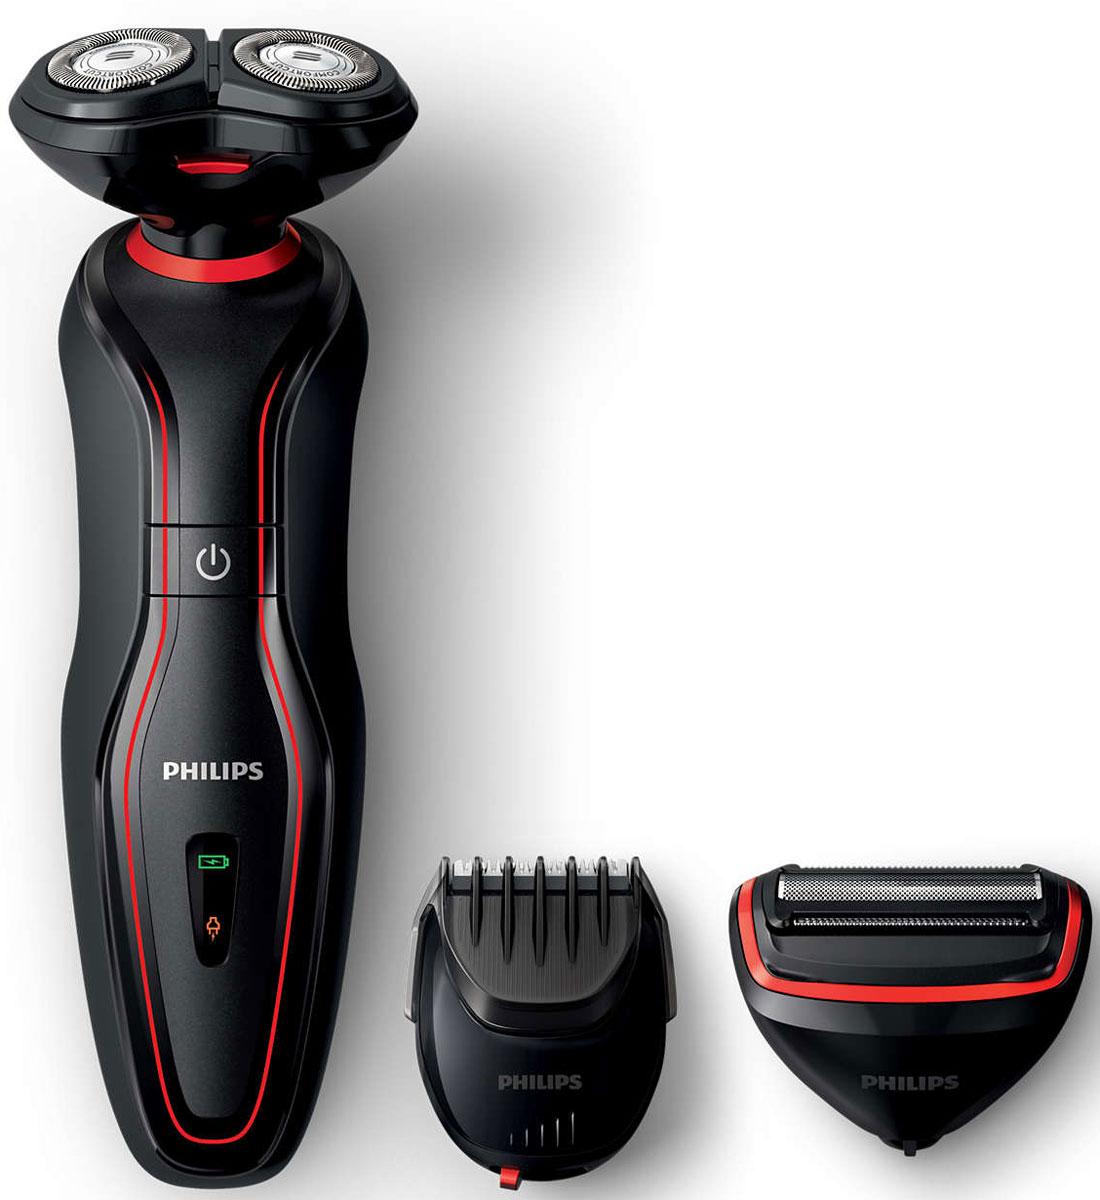 Philips Click&Style S738/17 электробритва, триммер и стайлер 3 в 1